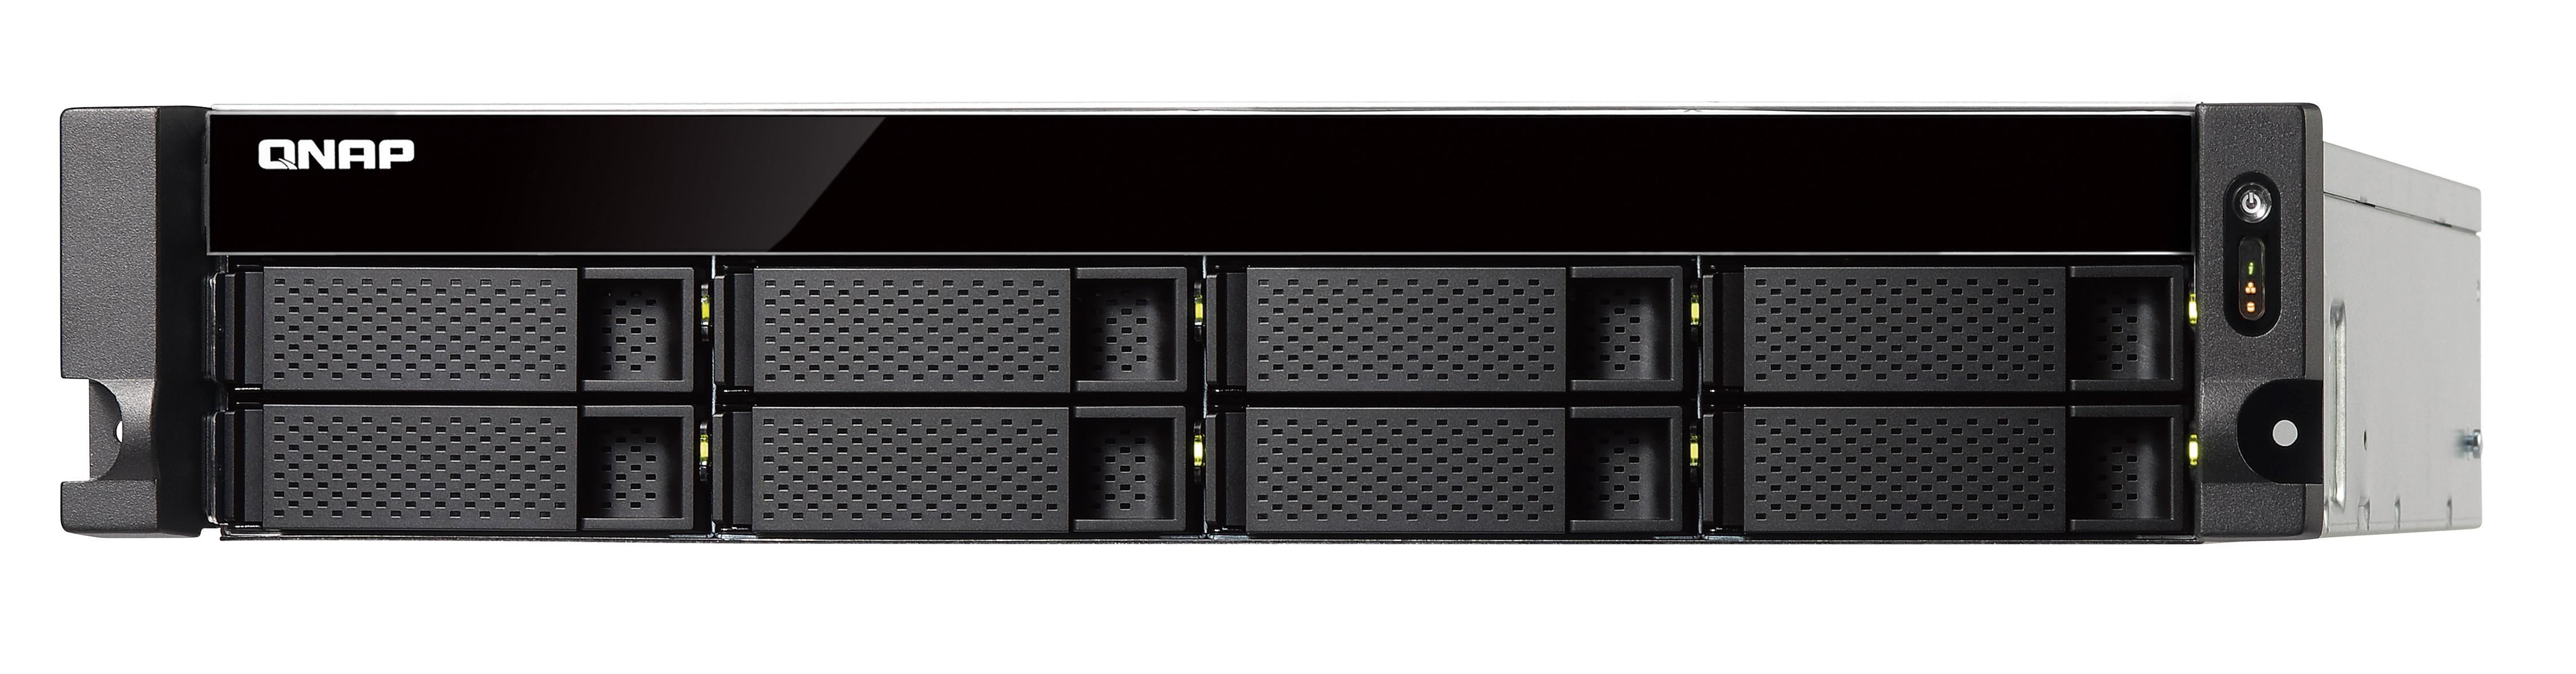 QNAP TS-831XU-RP (1,7GHz/4GB/8xSATA/10GbE SFP+)